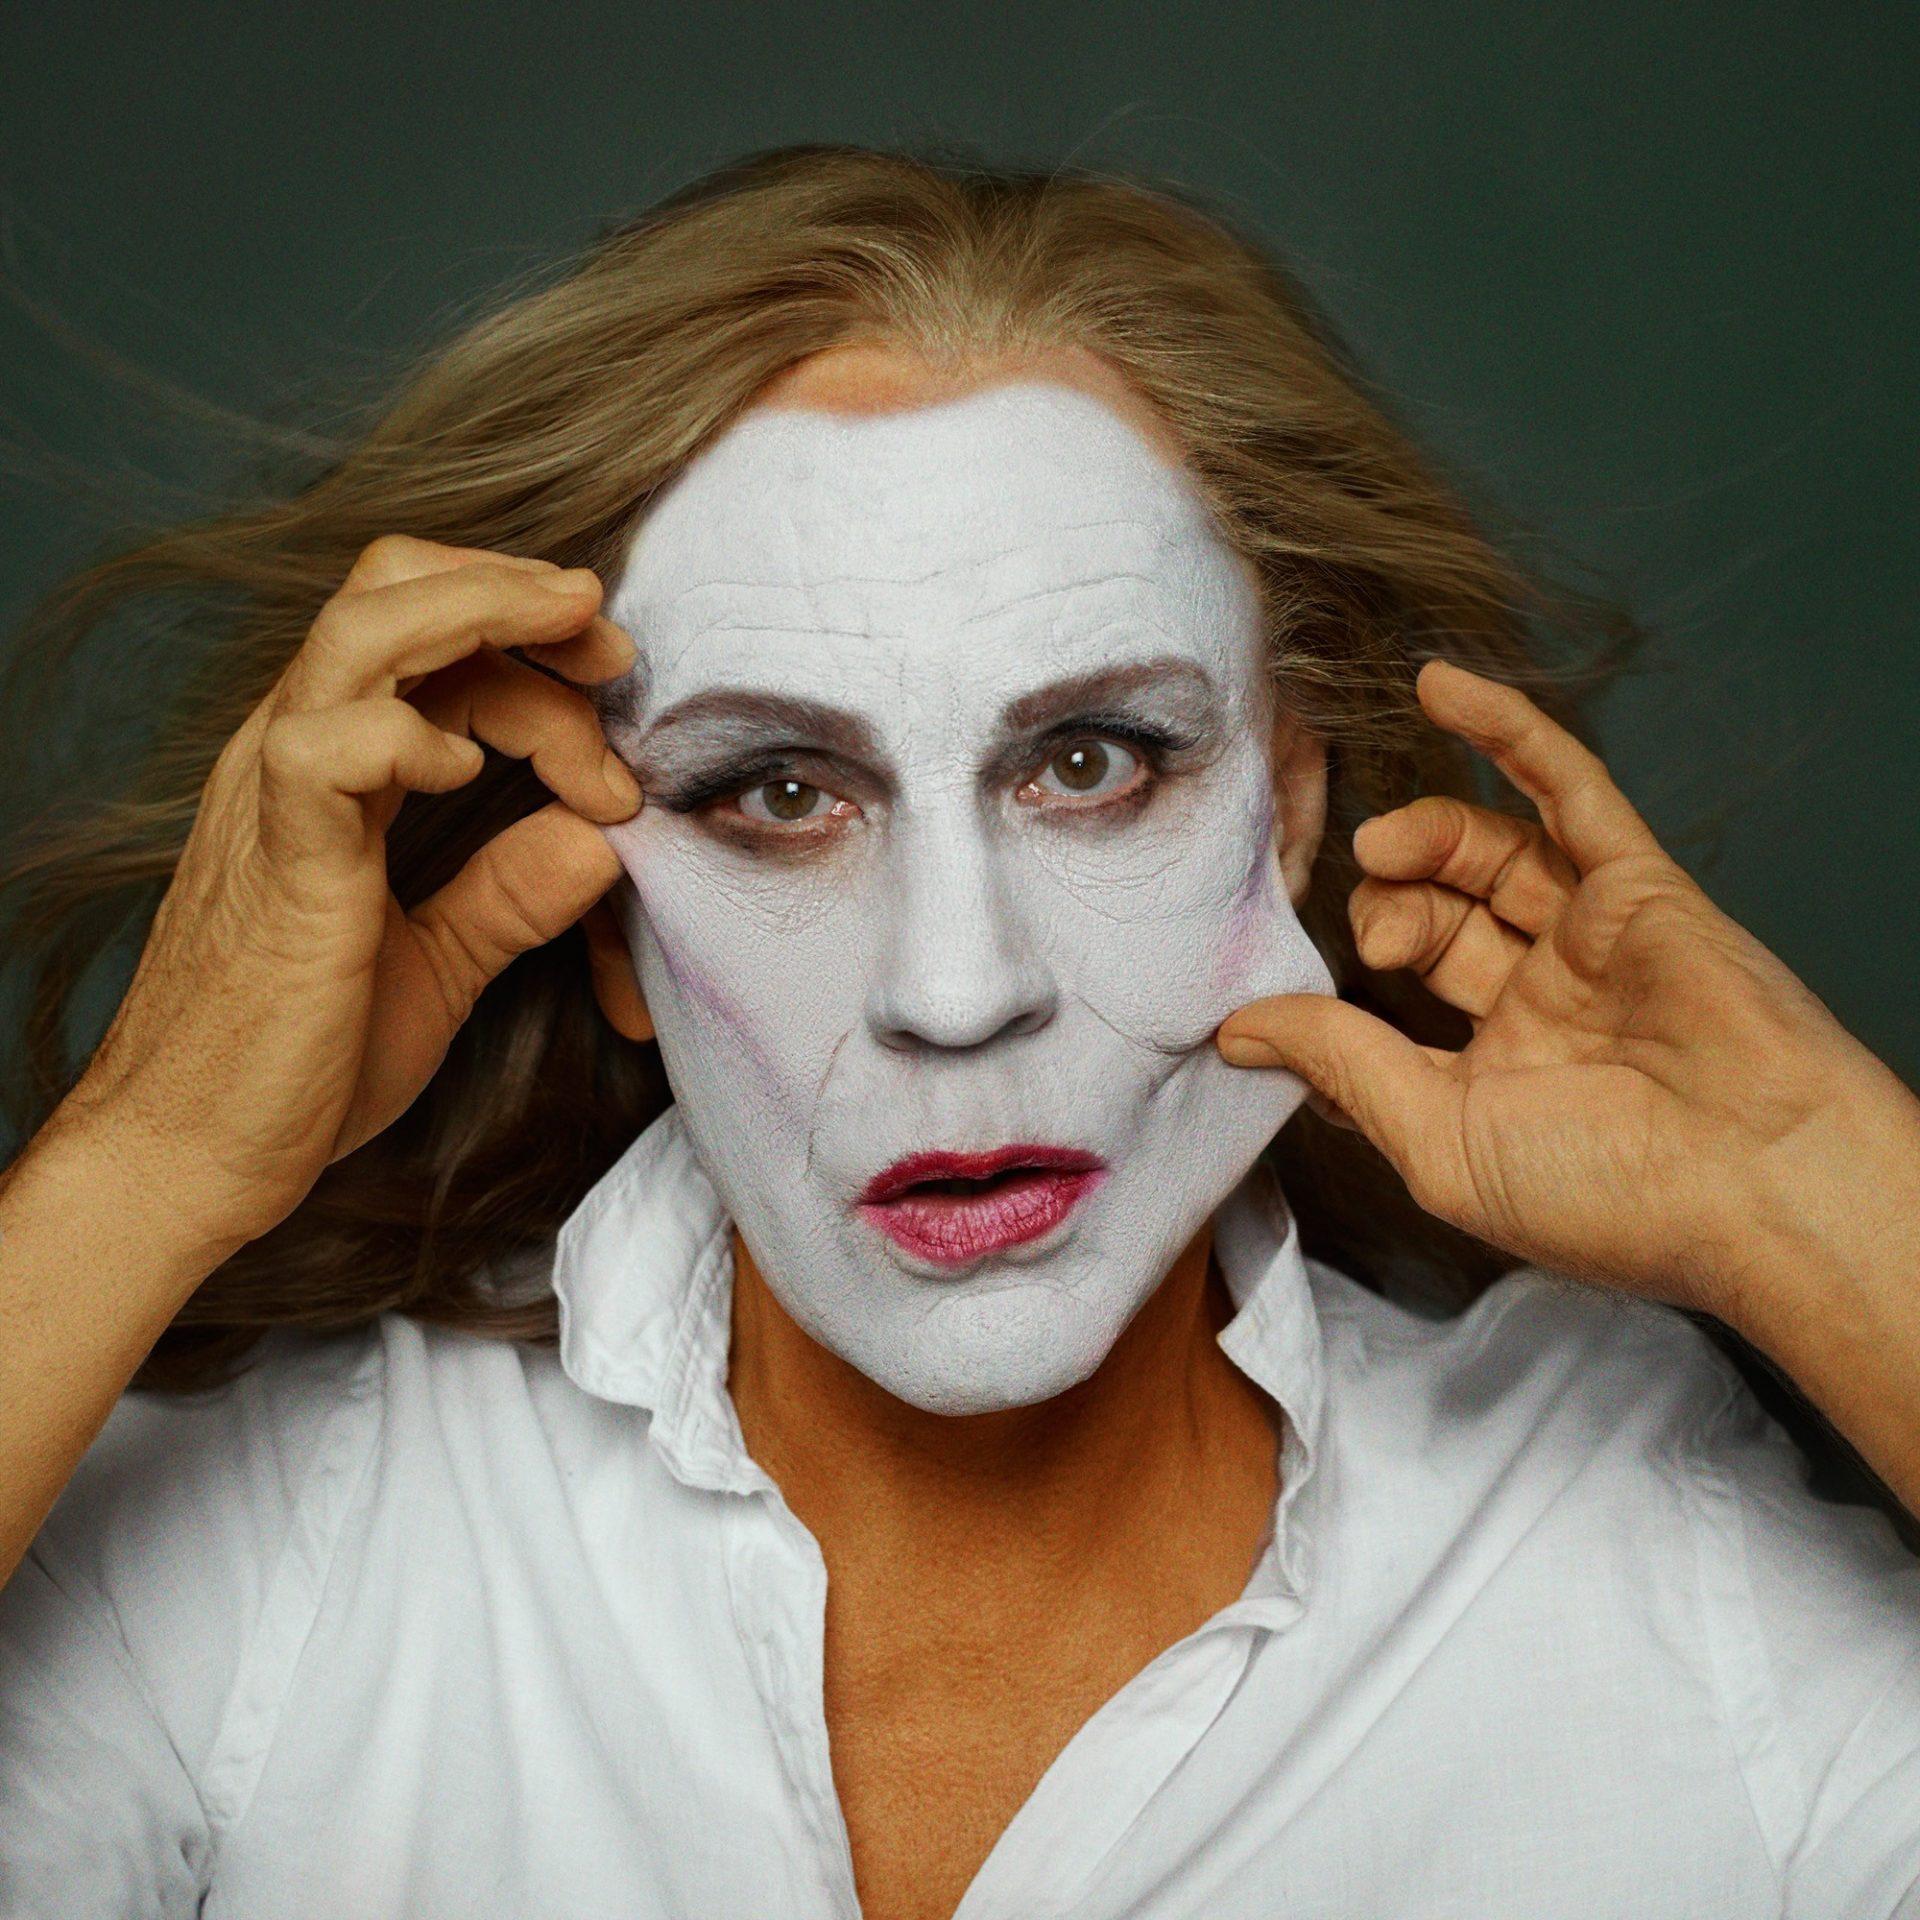 Annie Leibovitz Meryl Streep 2014 6 - Milano Photofestival